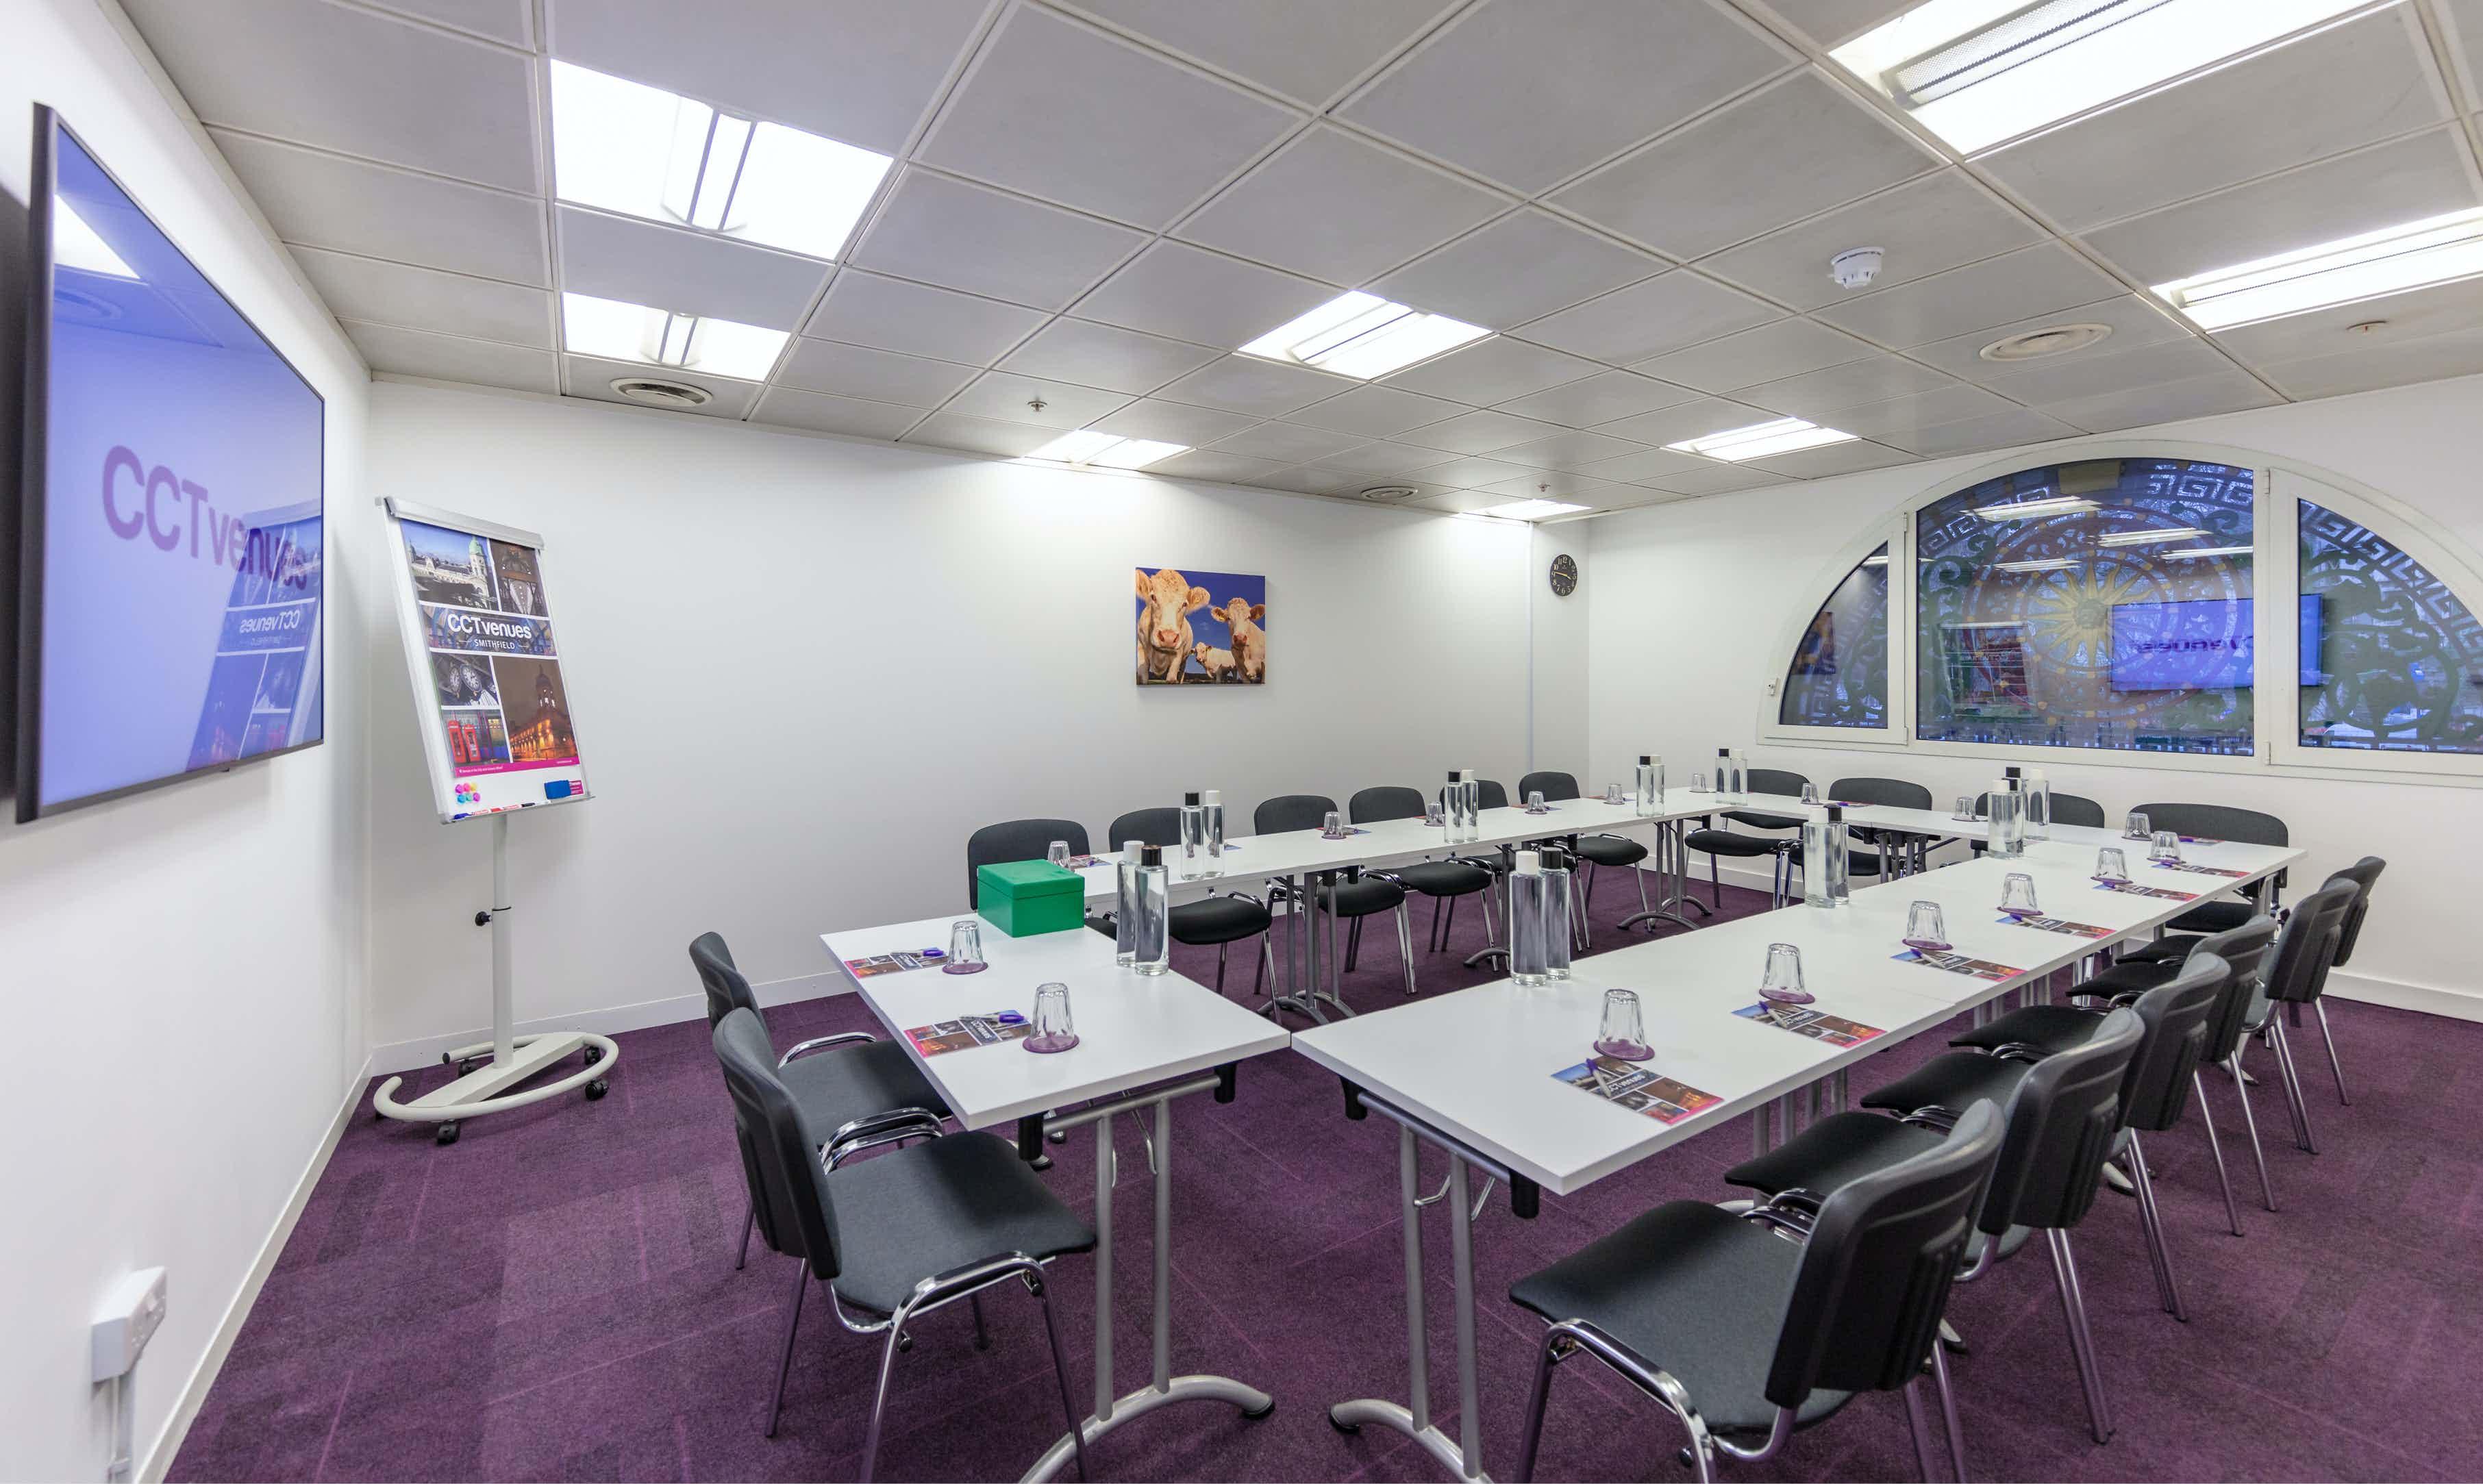 Meeting Room 3, CCT Venues, Smithfield